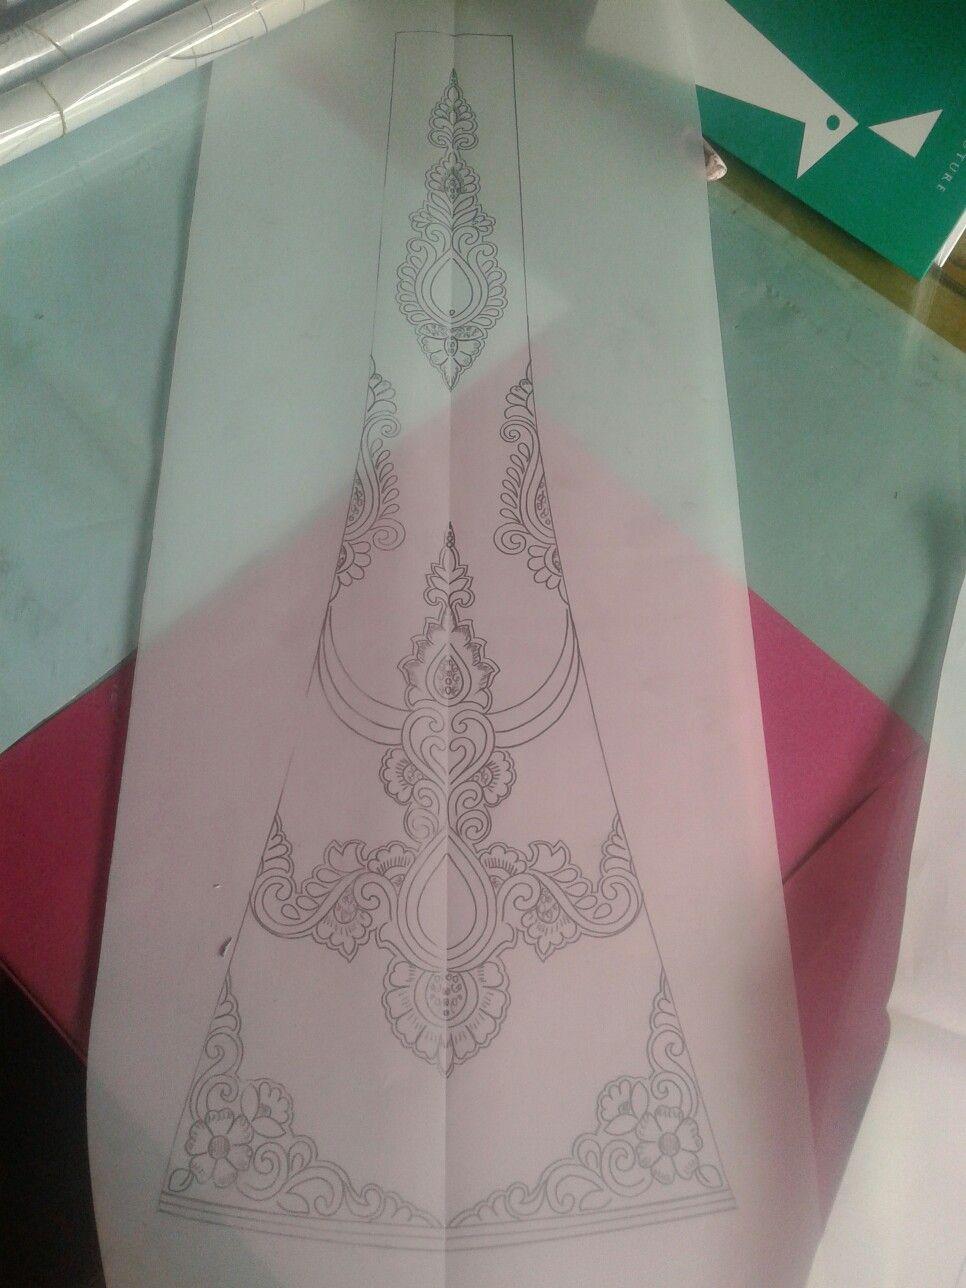 Pin de Najwa Elmatlouai en Couture   Pinterest   Dibujos de diseño ...